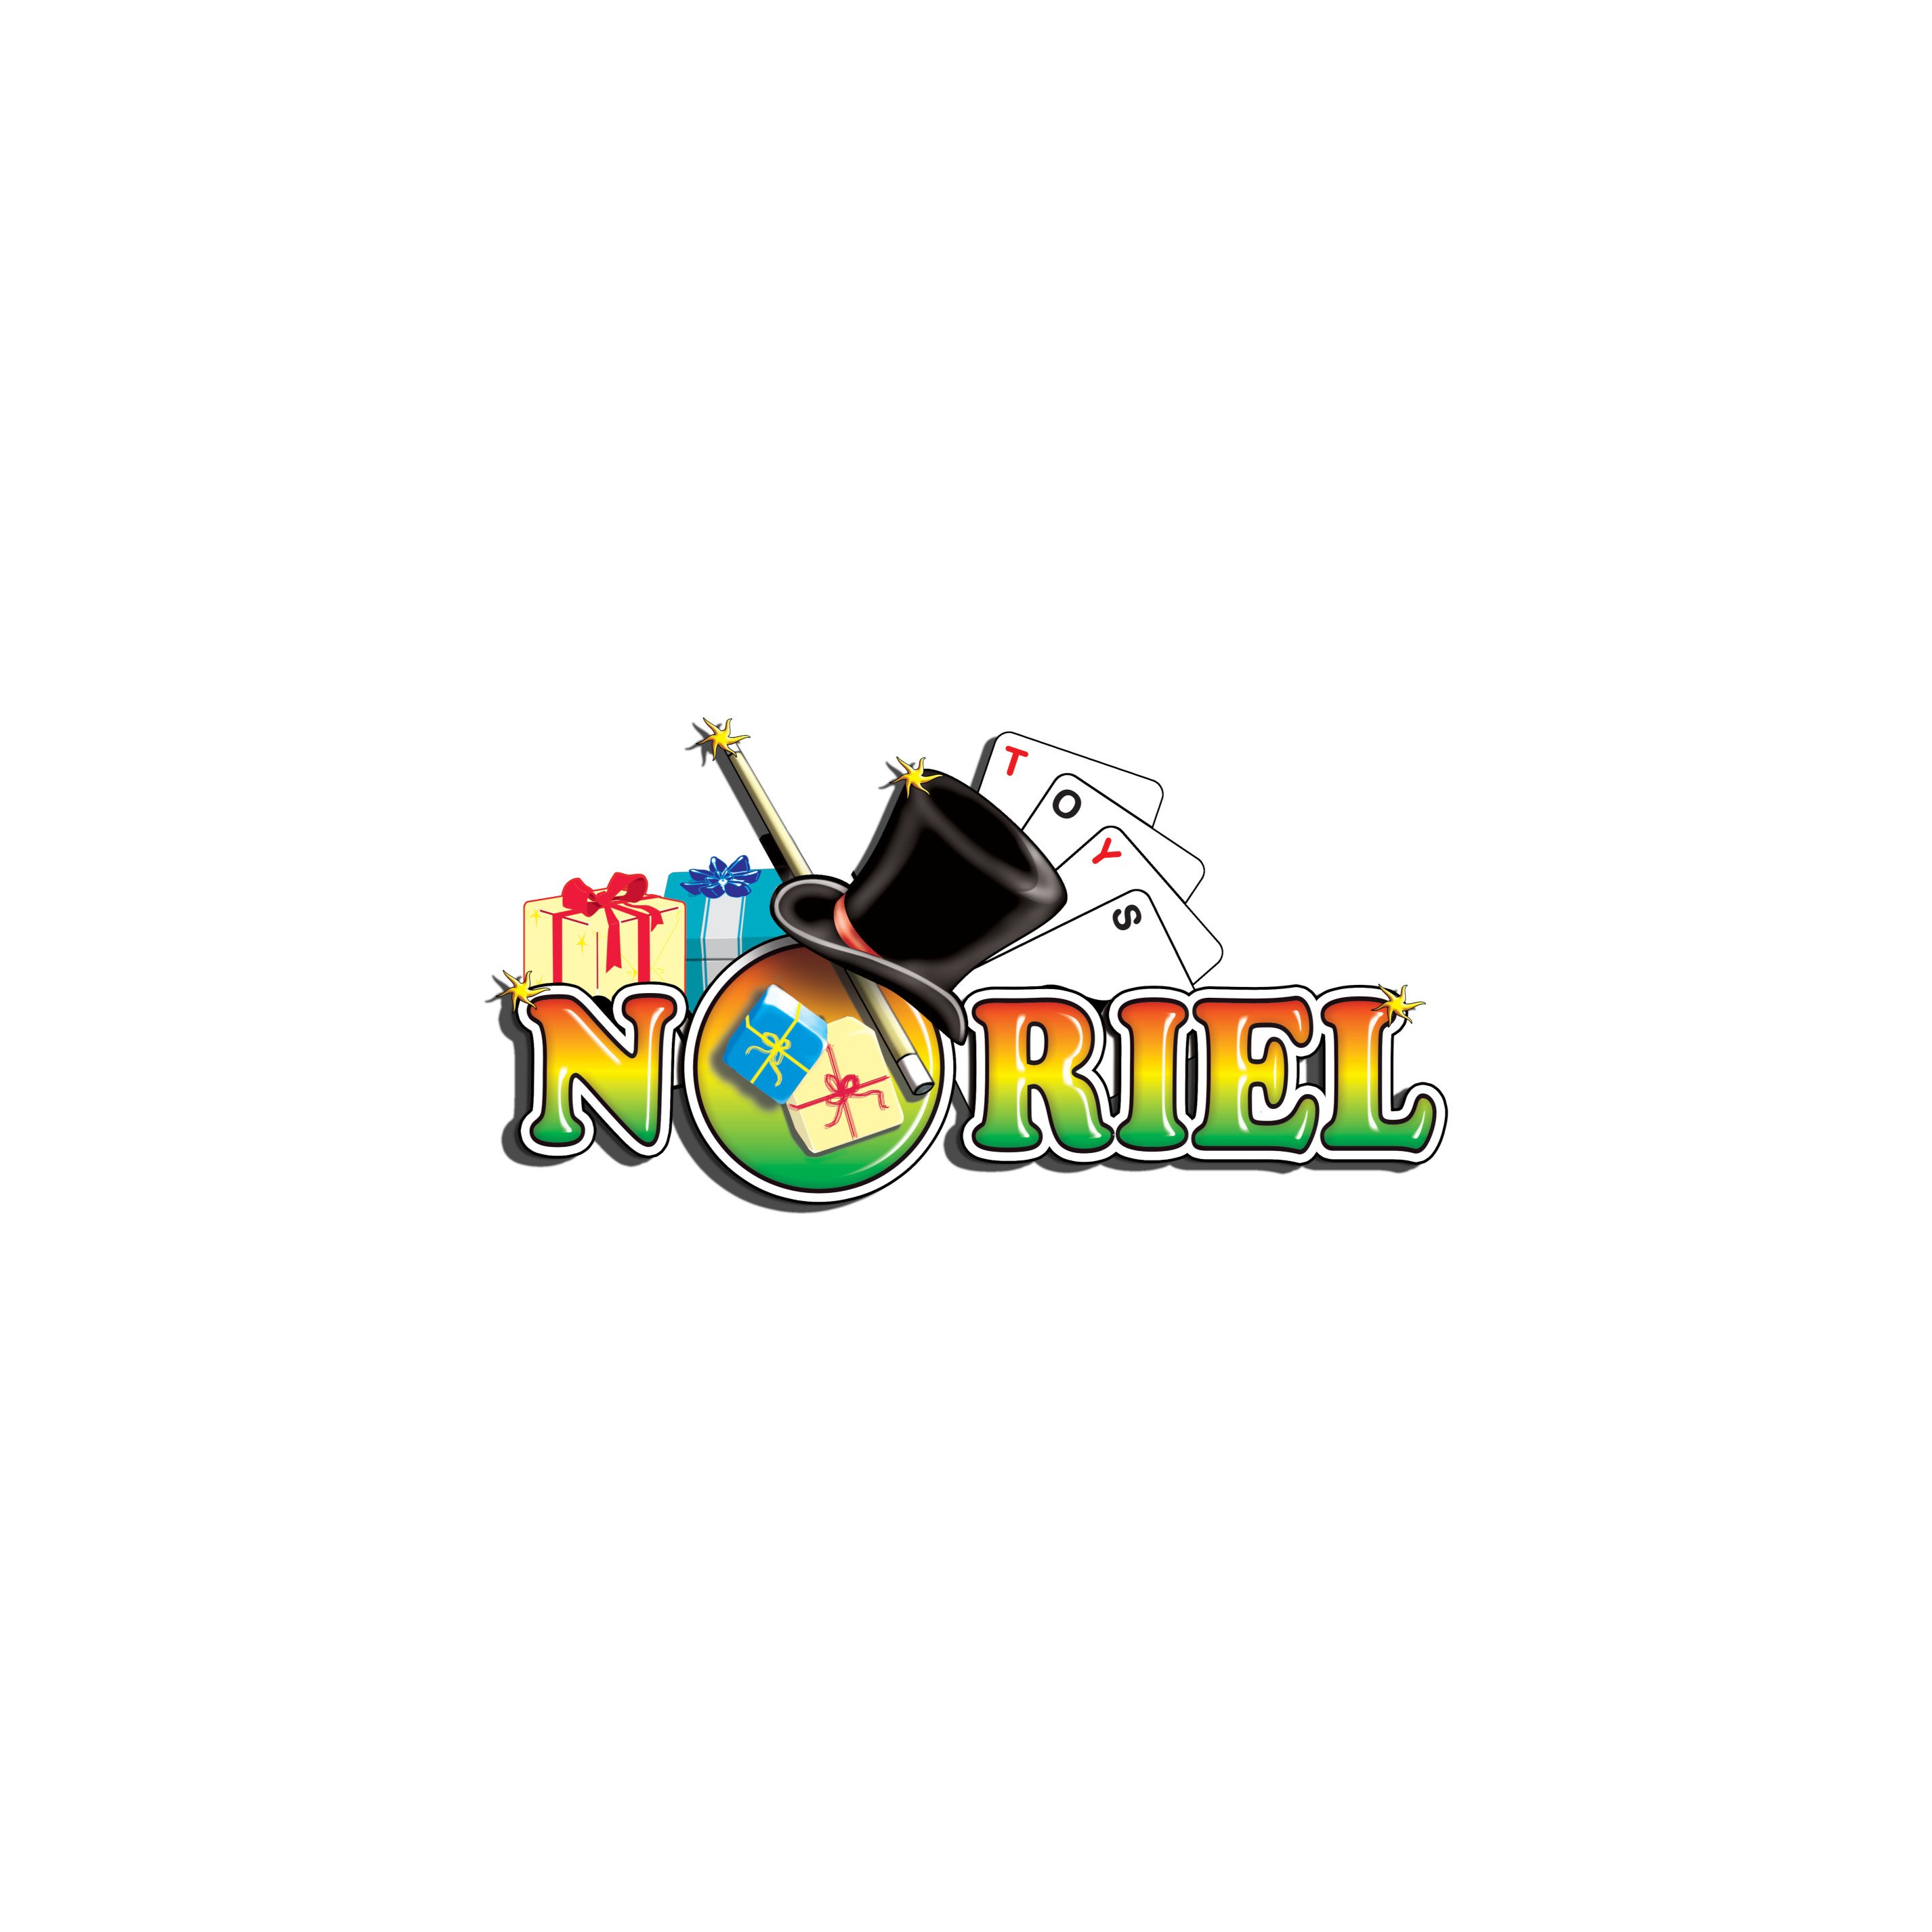 INT_N0755_001w Set Titirez Deluxe Doodletop cu Twister, Micul Artist